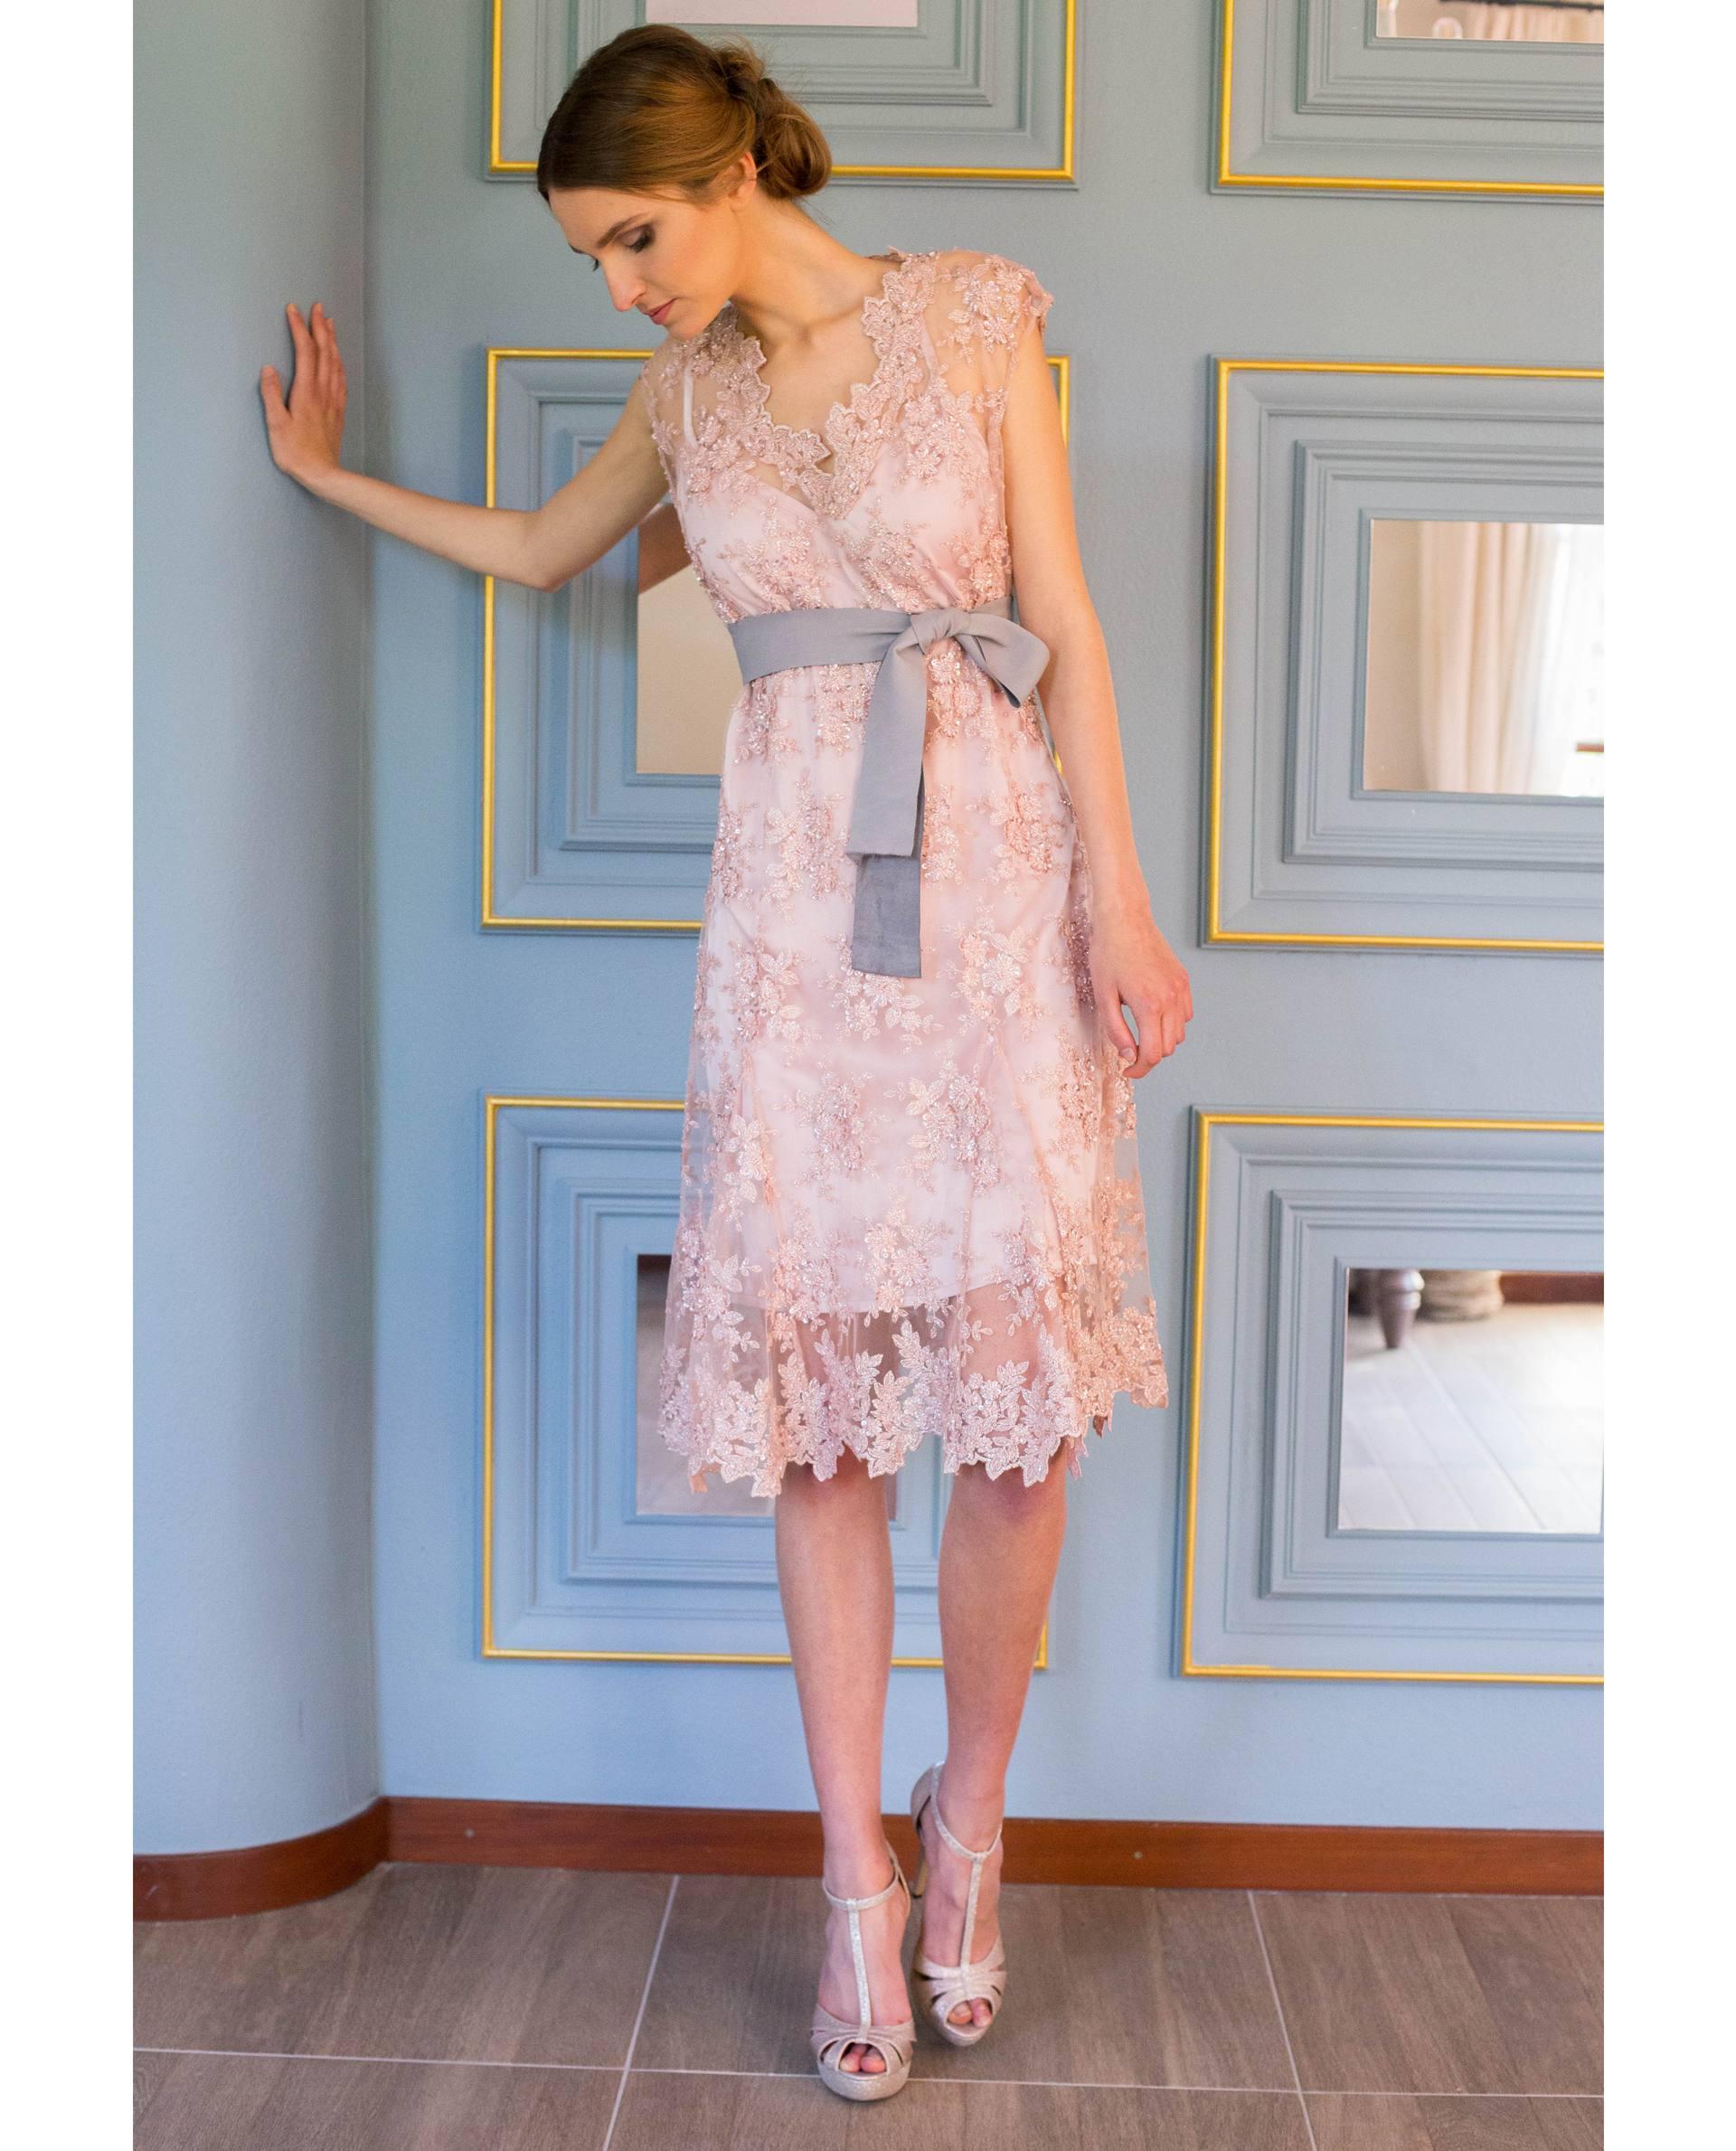 ATELIER-NATURE 2018/19 - VESTIDOS - vestido fiesta LUCIE rosa palo